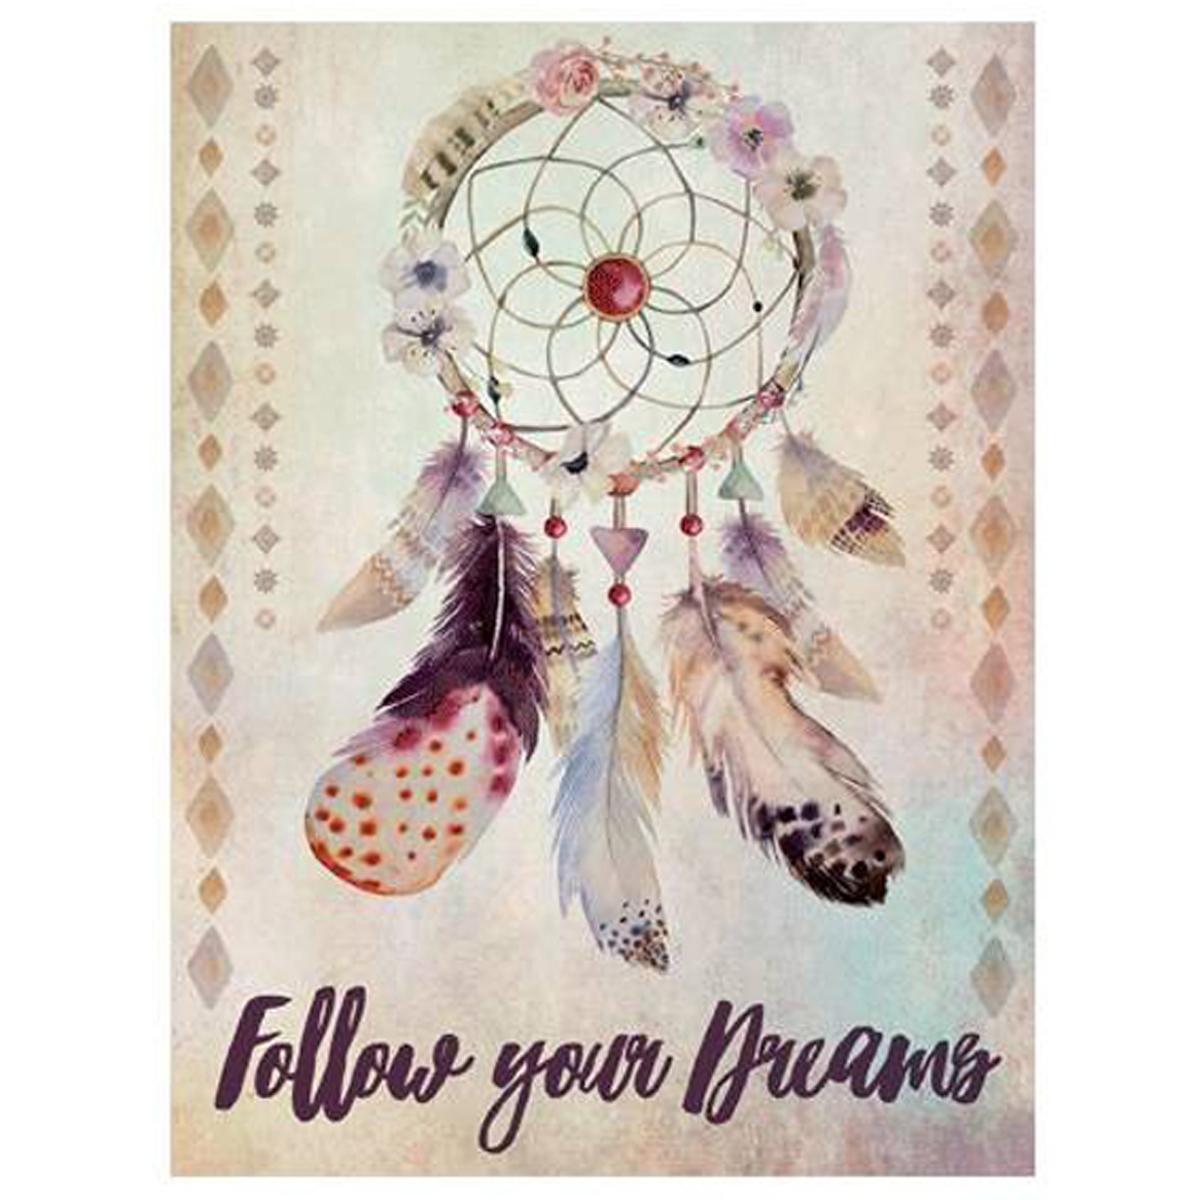 Toile \'Boho\' beige multicolore (Follow your dreams) - 40x30 cm - [P1811]